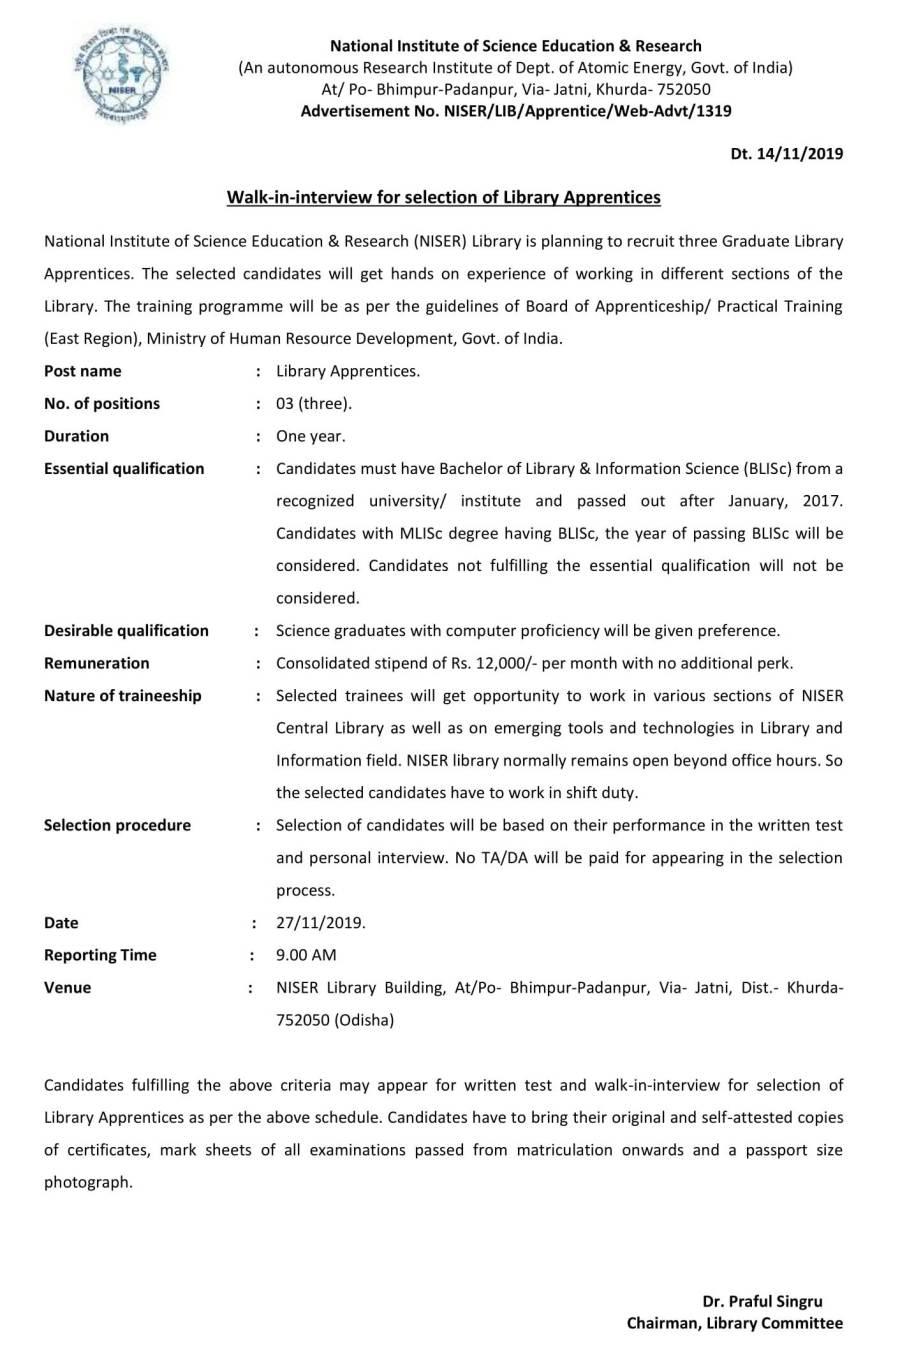 Advertisement-Lib-Apprentice_14112019-1.jpg